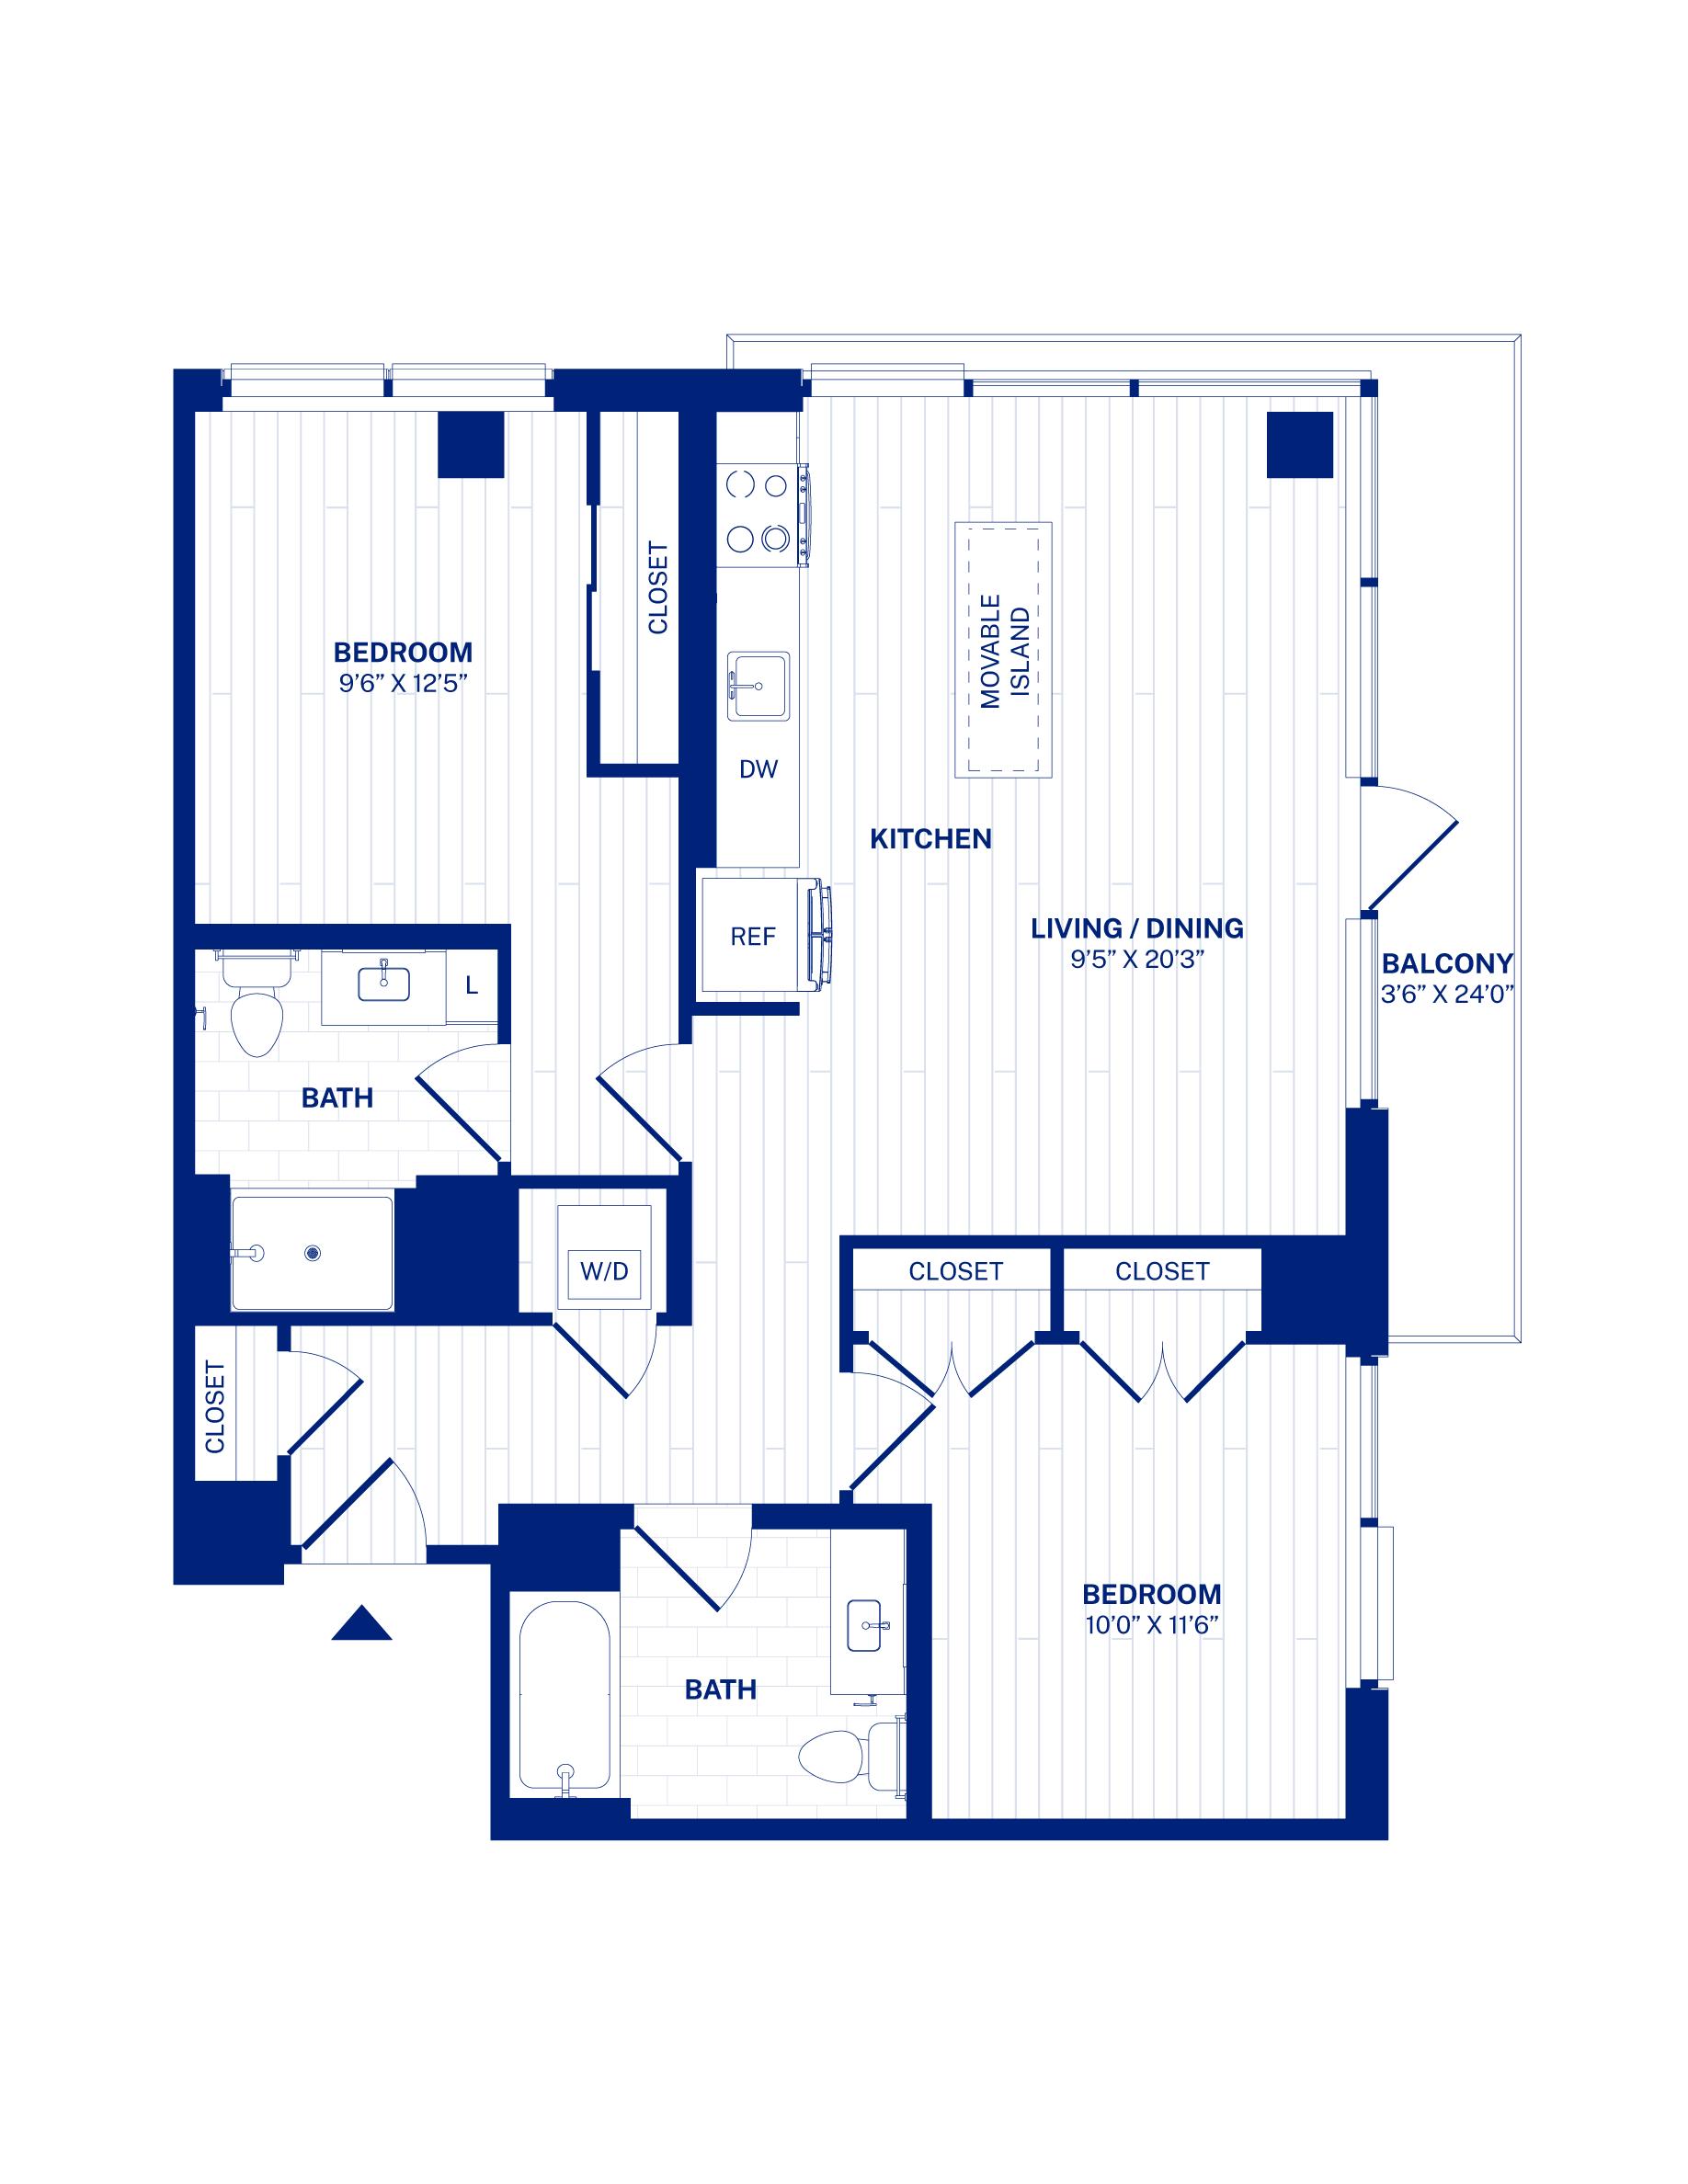 Residence 519 thumb